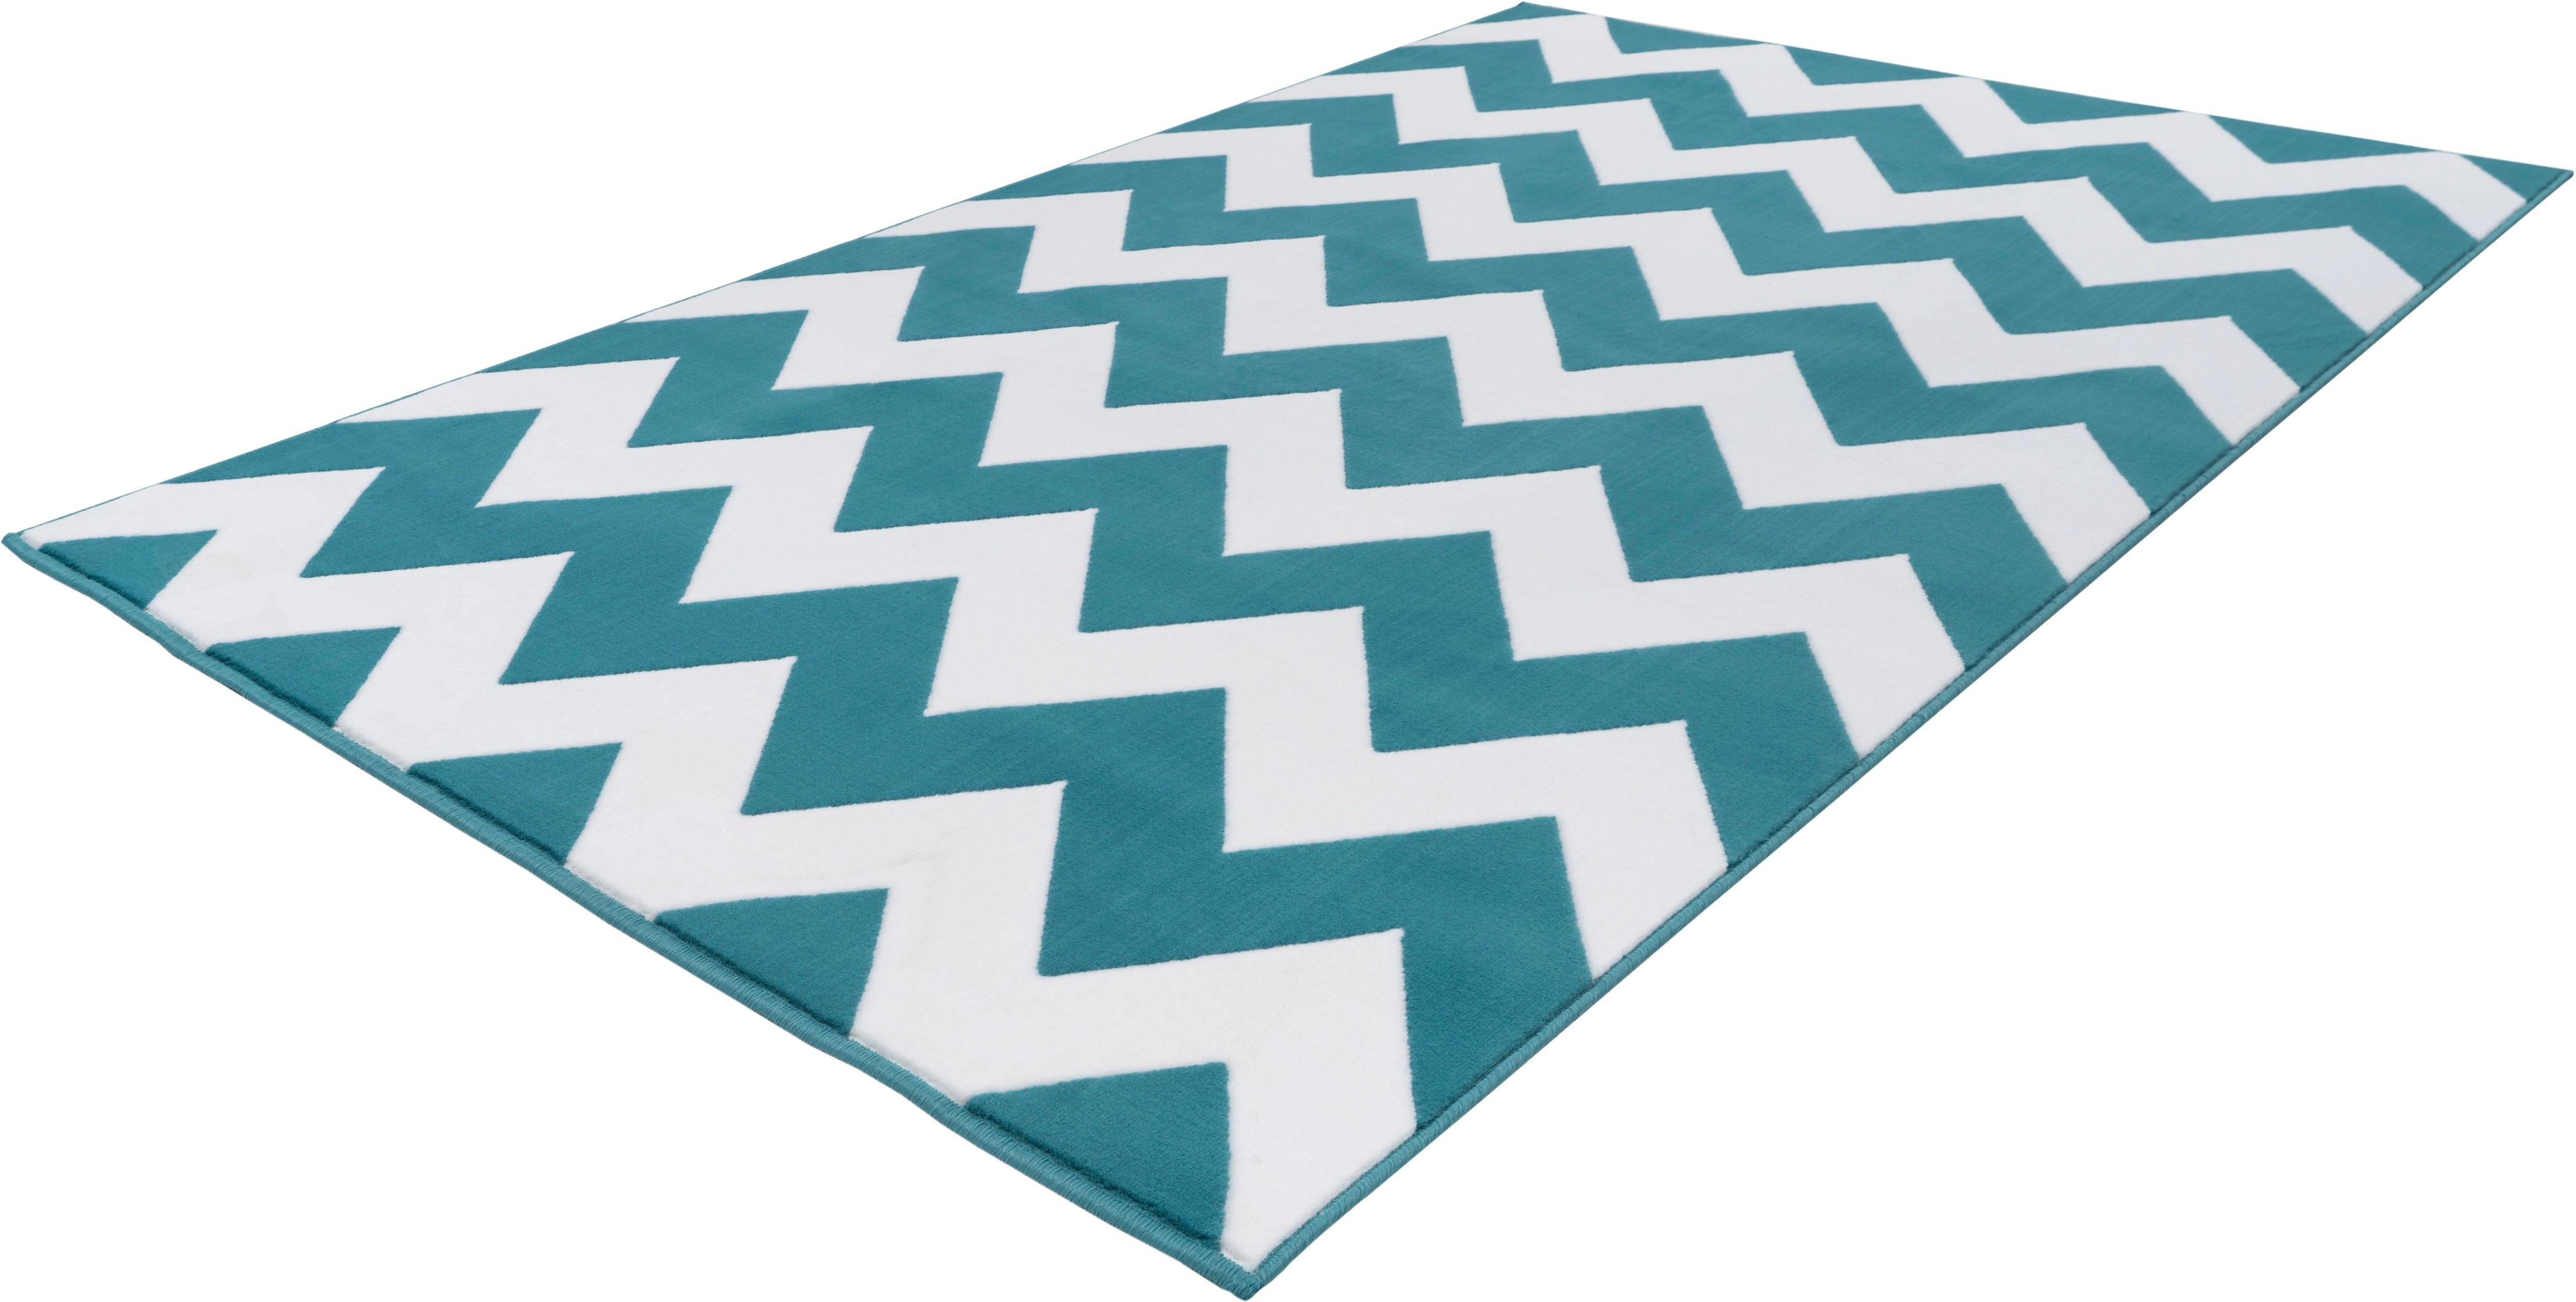 Zickzack-Muster Geometrisch Kayoom Teppich Manolya 2095 Grün Höhe 10 mm